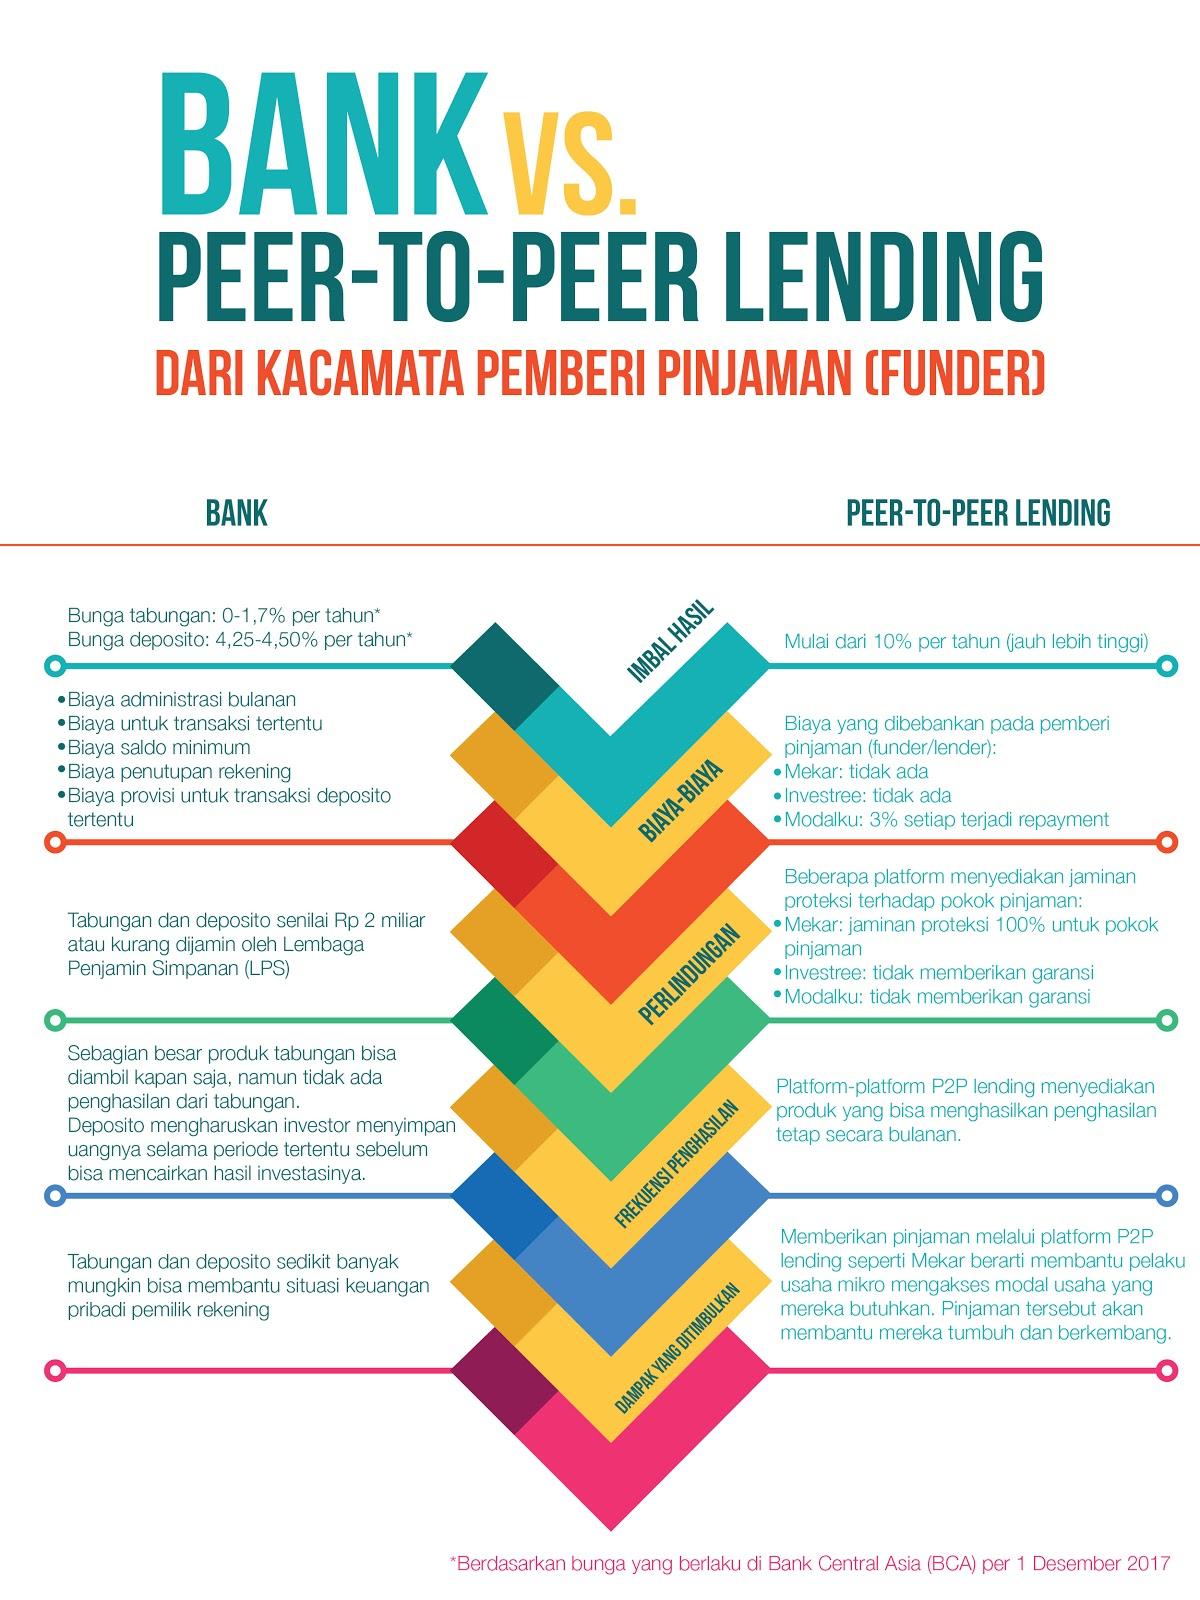 Infografis Bank vs P2P Lending Perspektif Funder